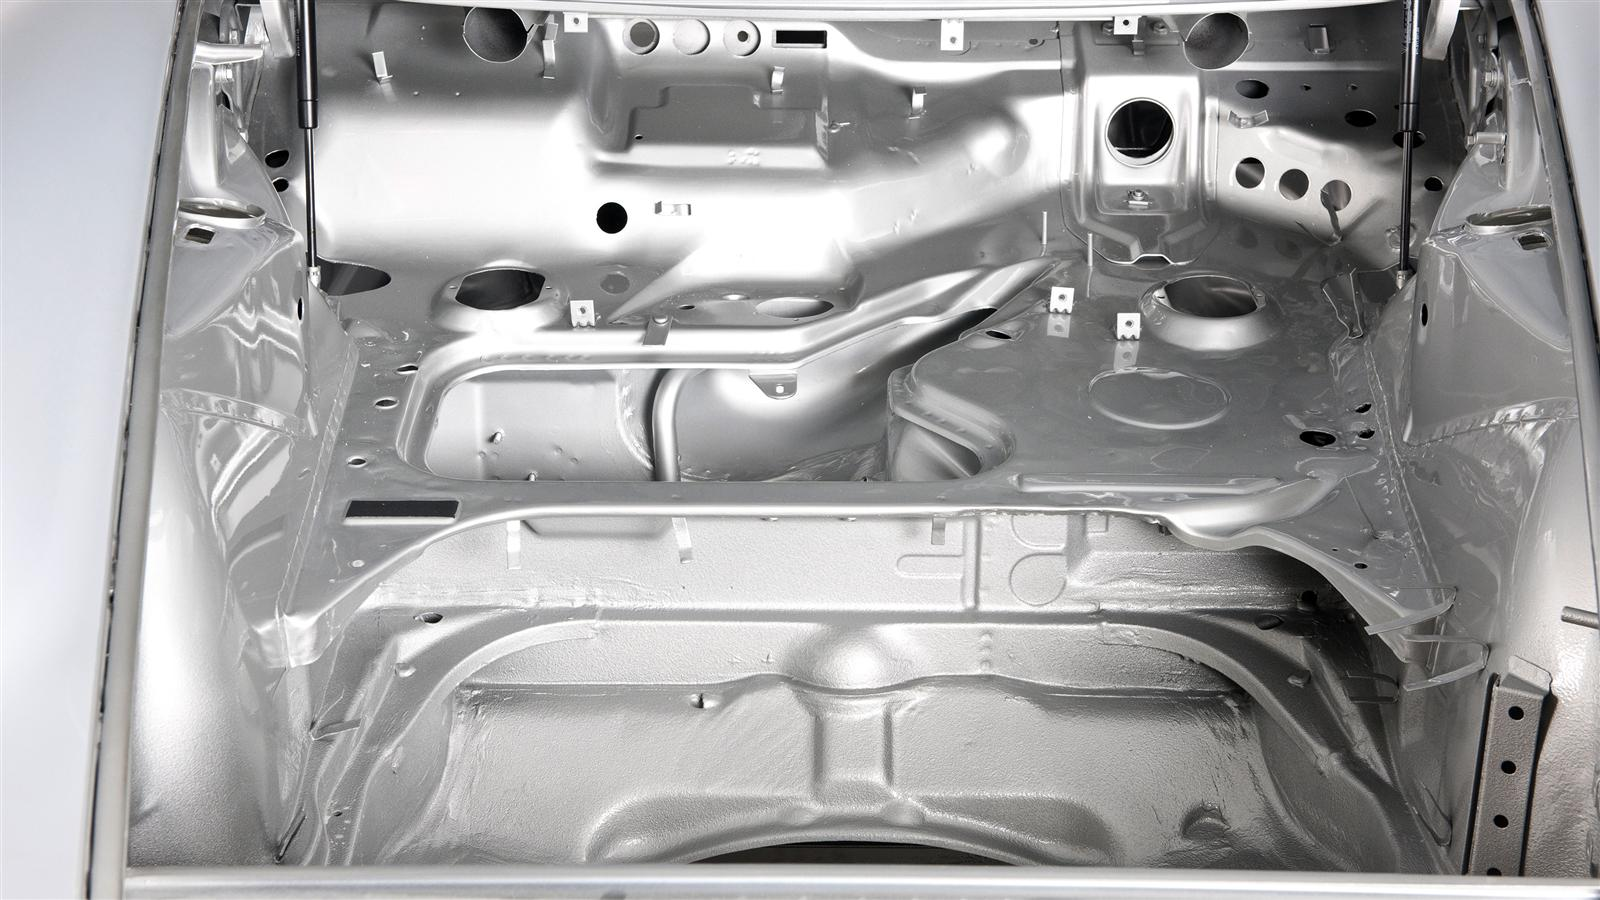 Porsche 911 Factory metal work